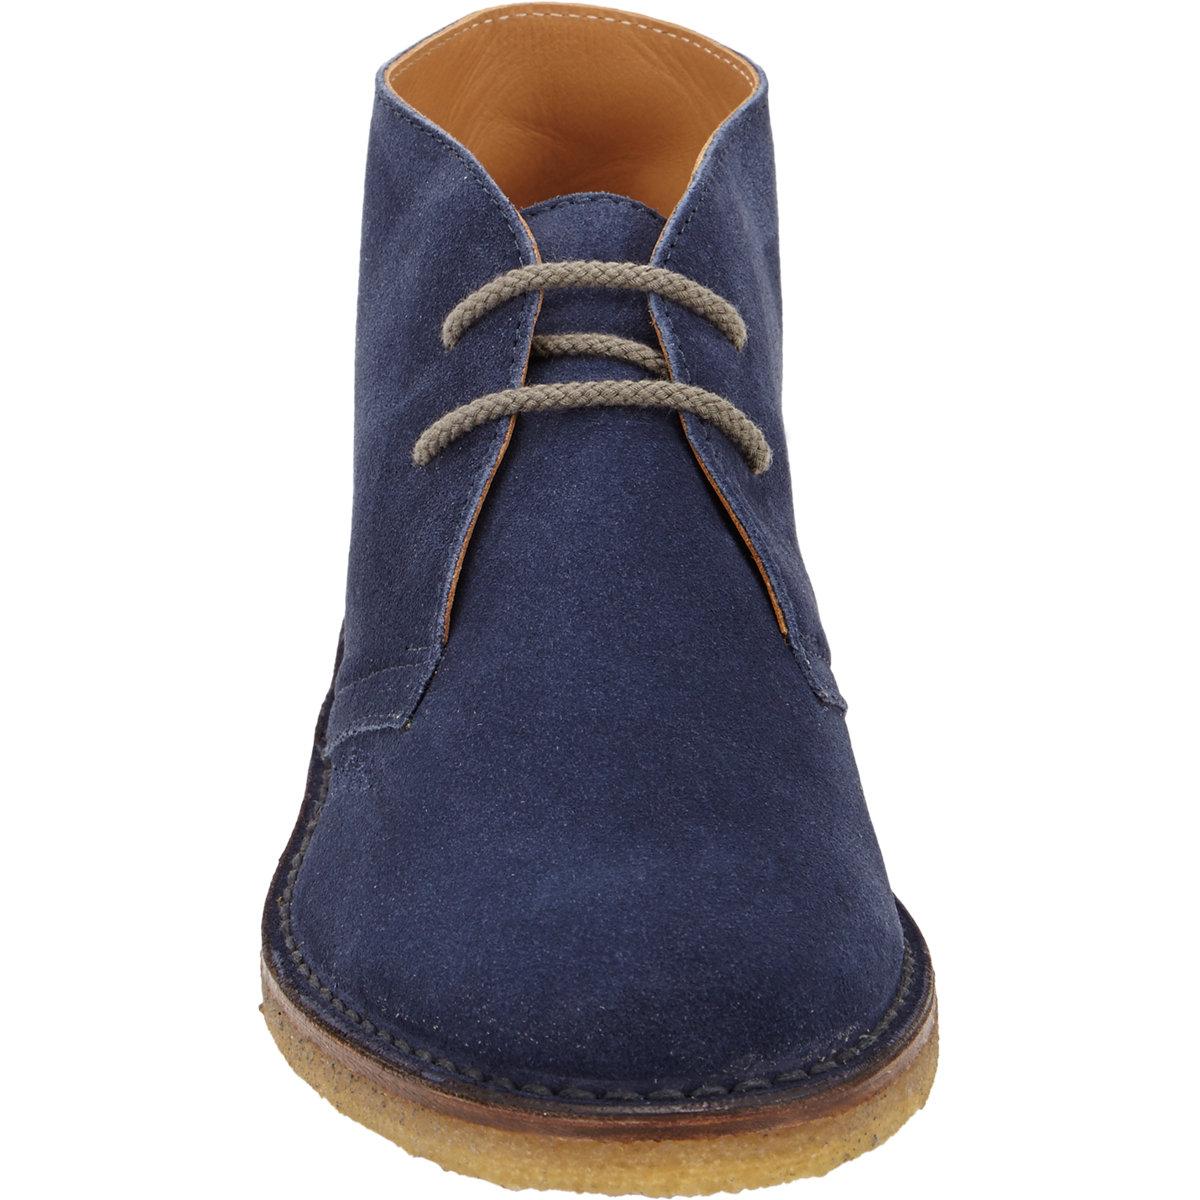 Lyst Barneys New York Suede Desert Chukka Boots In Blue